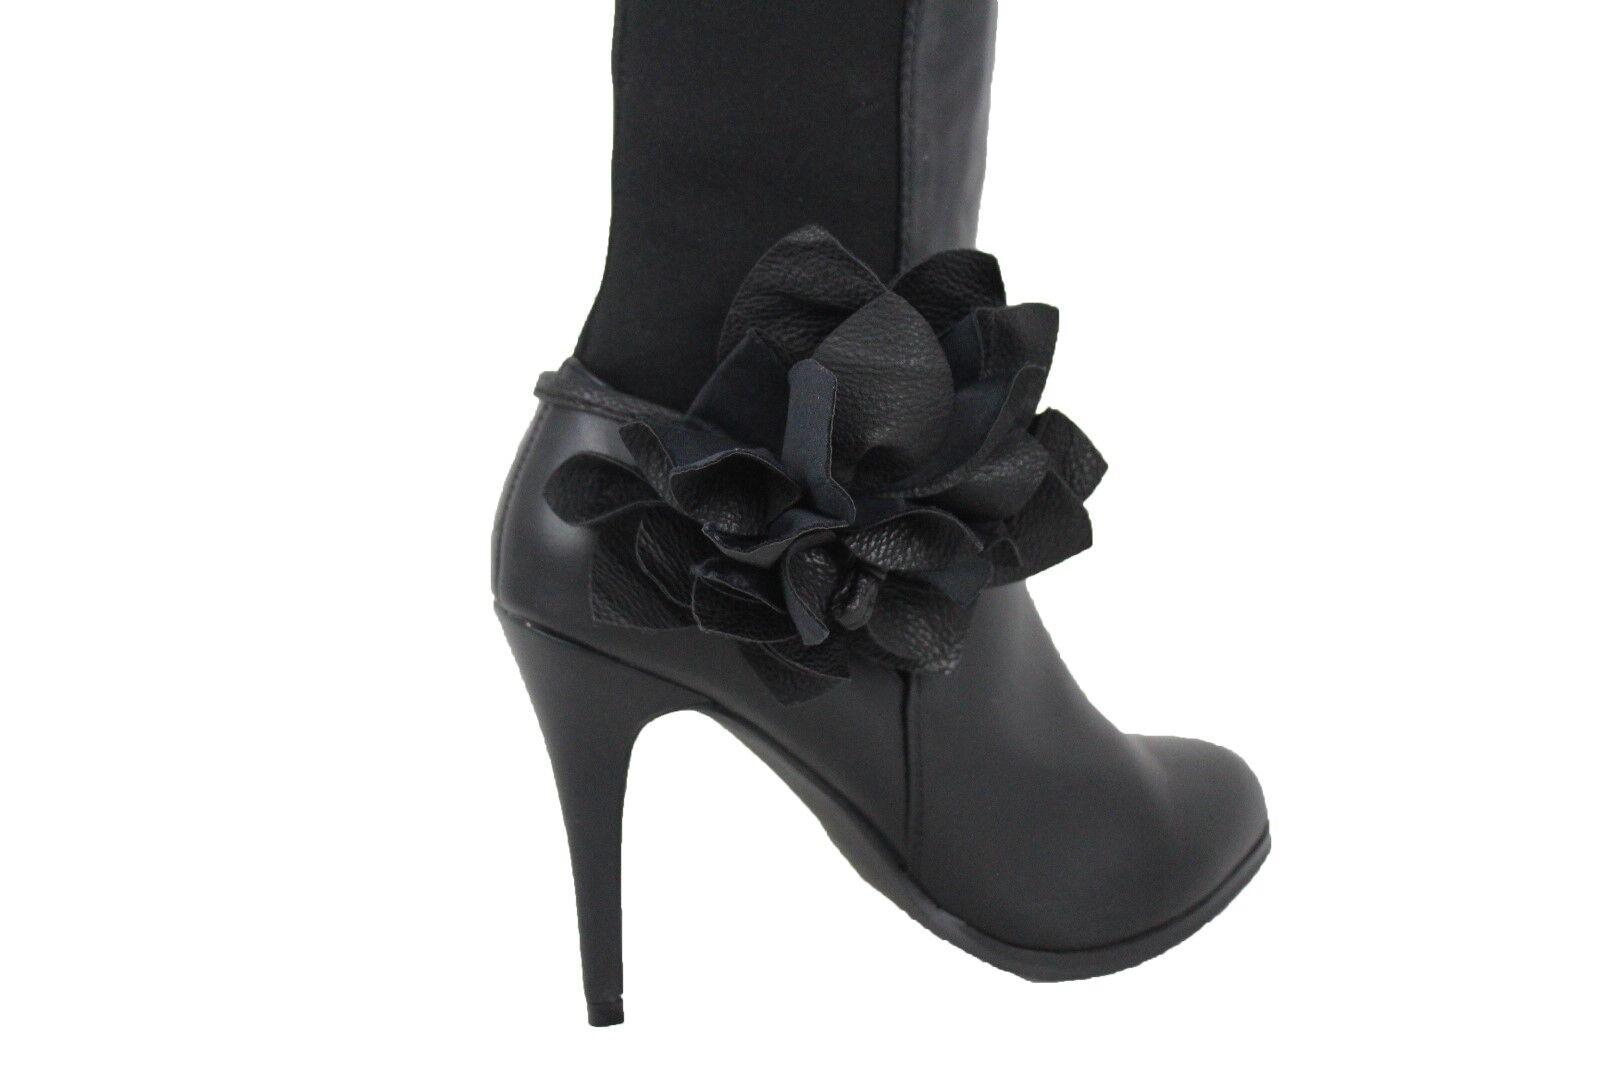 Women Boot Bracelet Black Faux Leather Shoe Flower Rose Charm Tie Wrap Fabric